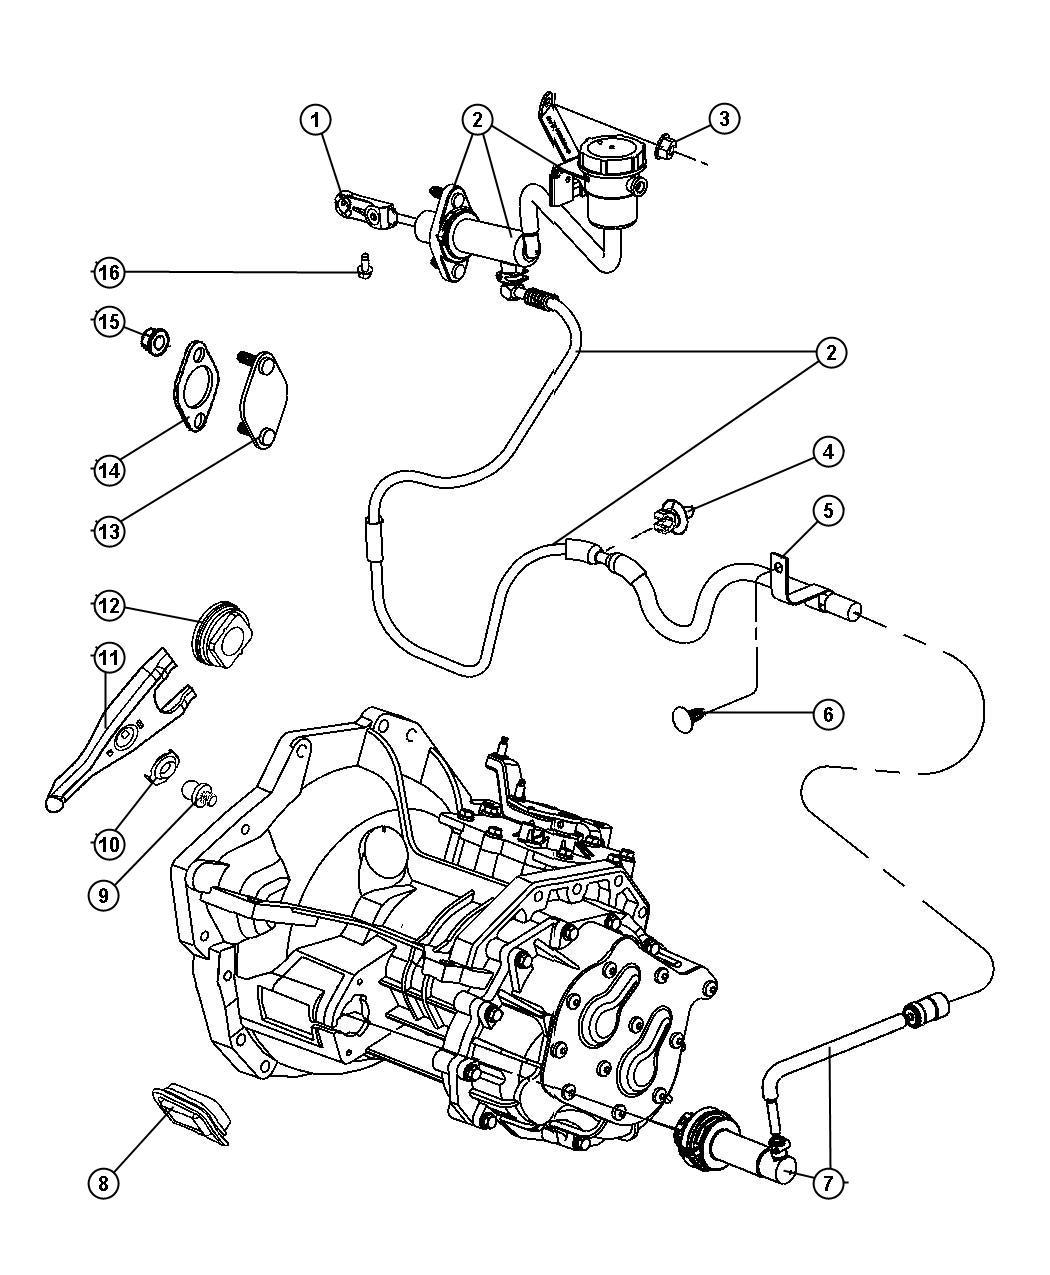 2005 Dodge Neon Transmission Diagram